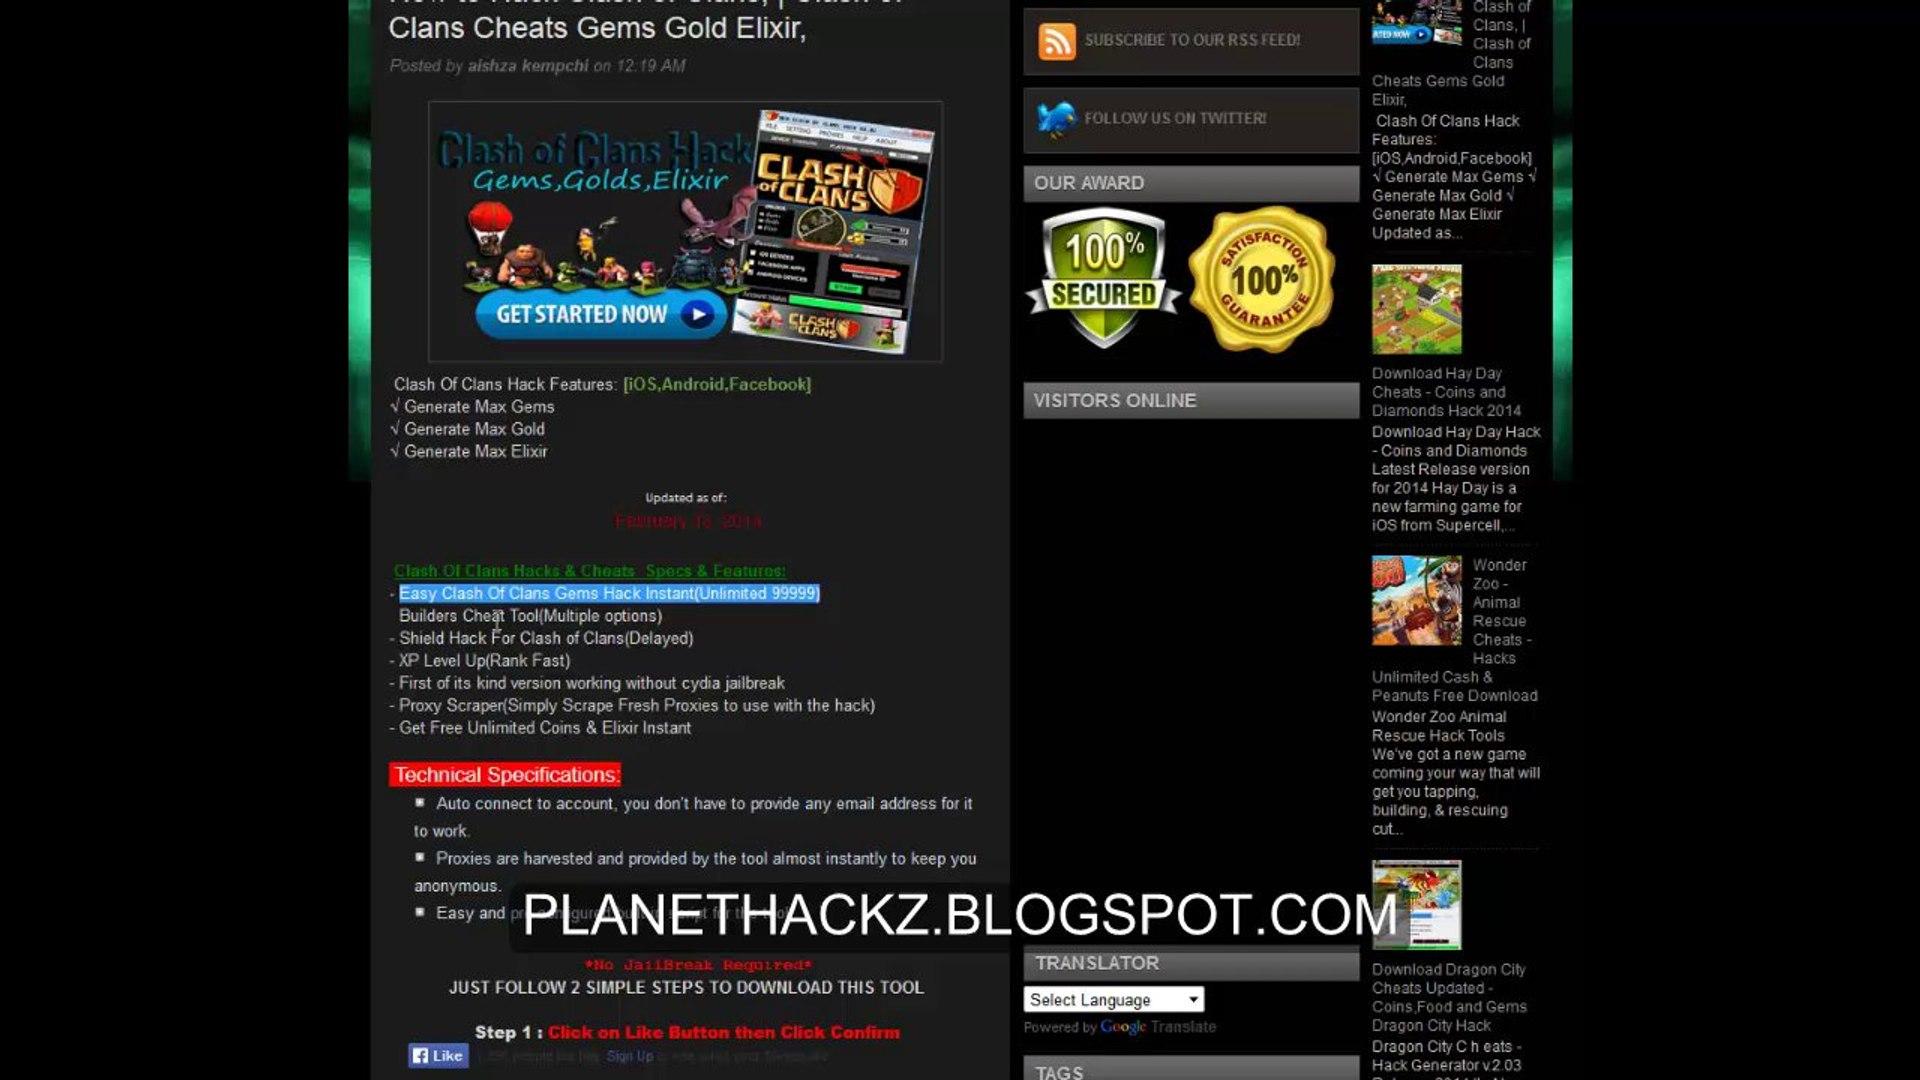 Clash of Clans Glitch GEMS ELIXER GOLD Cheat